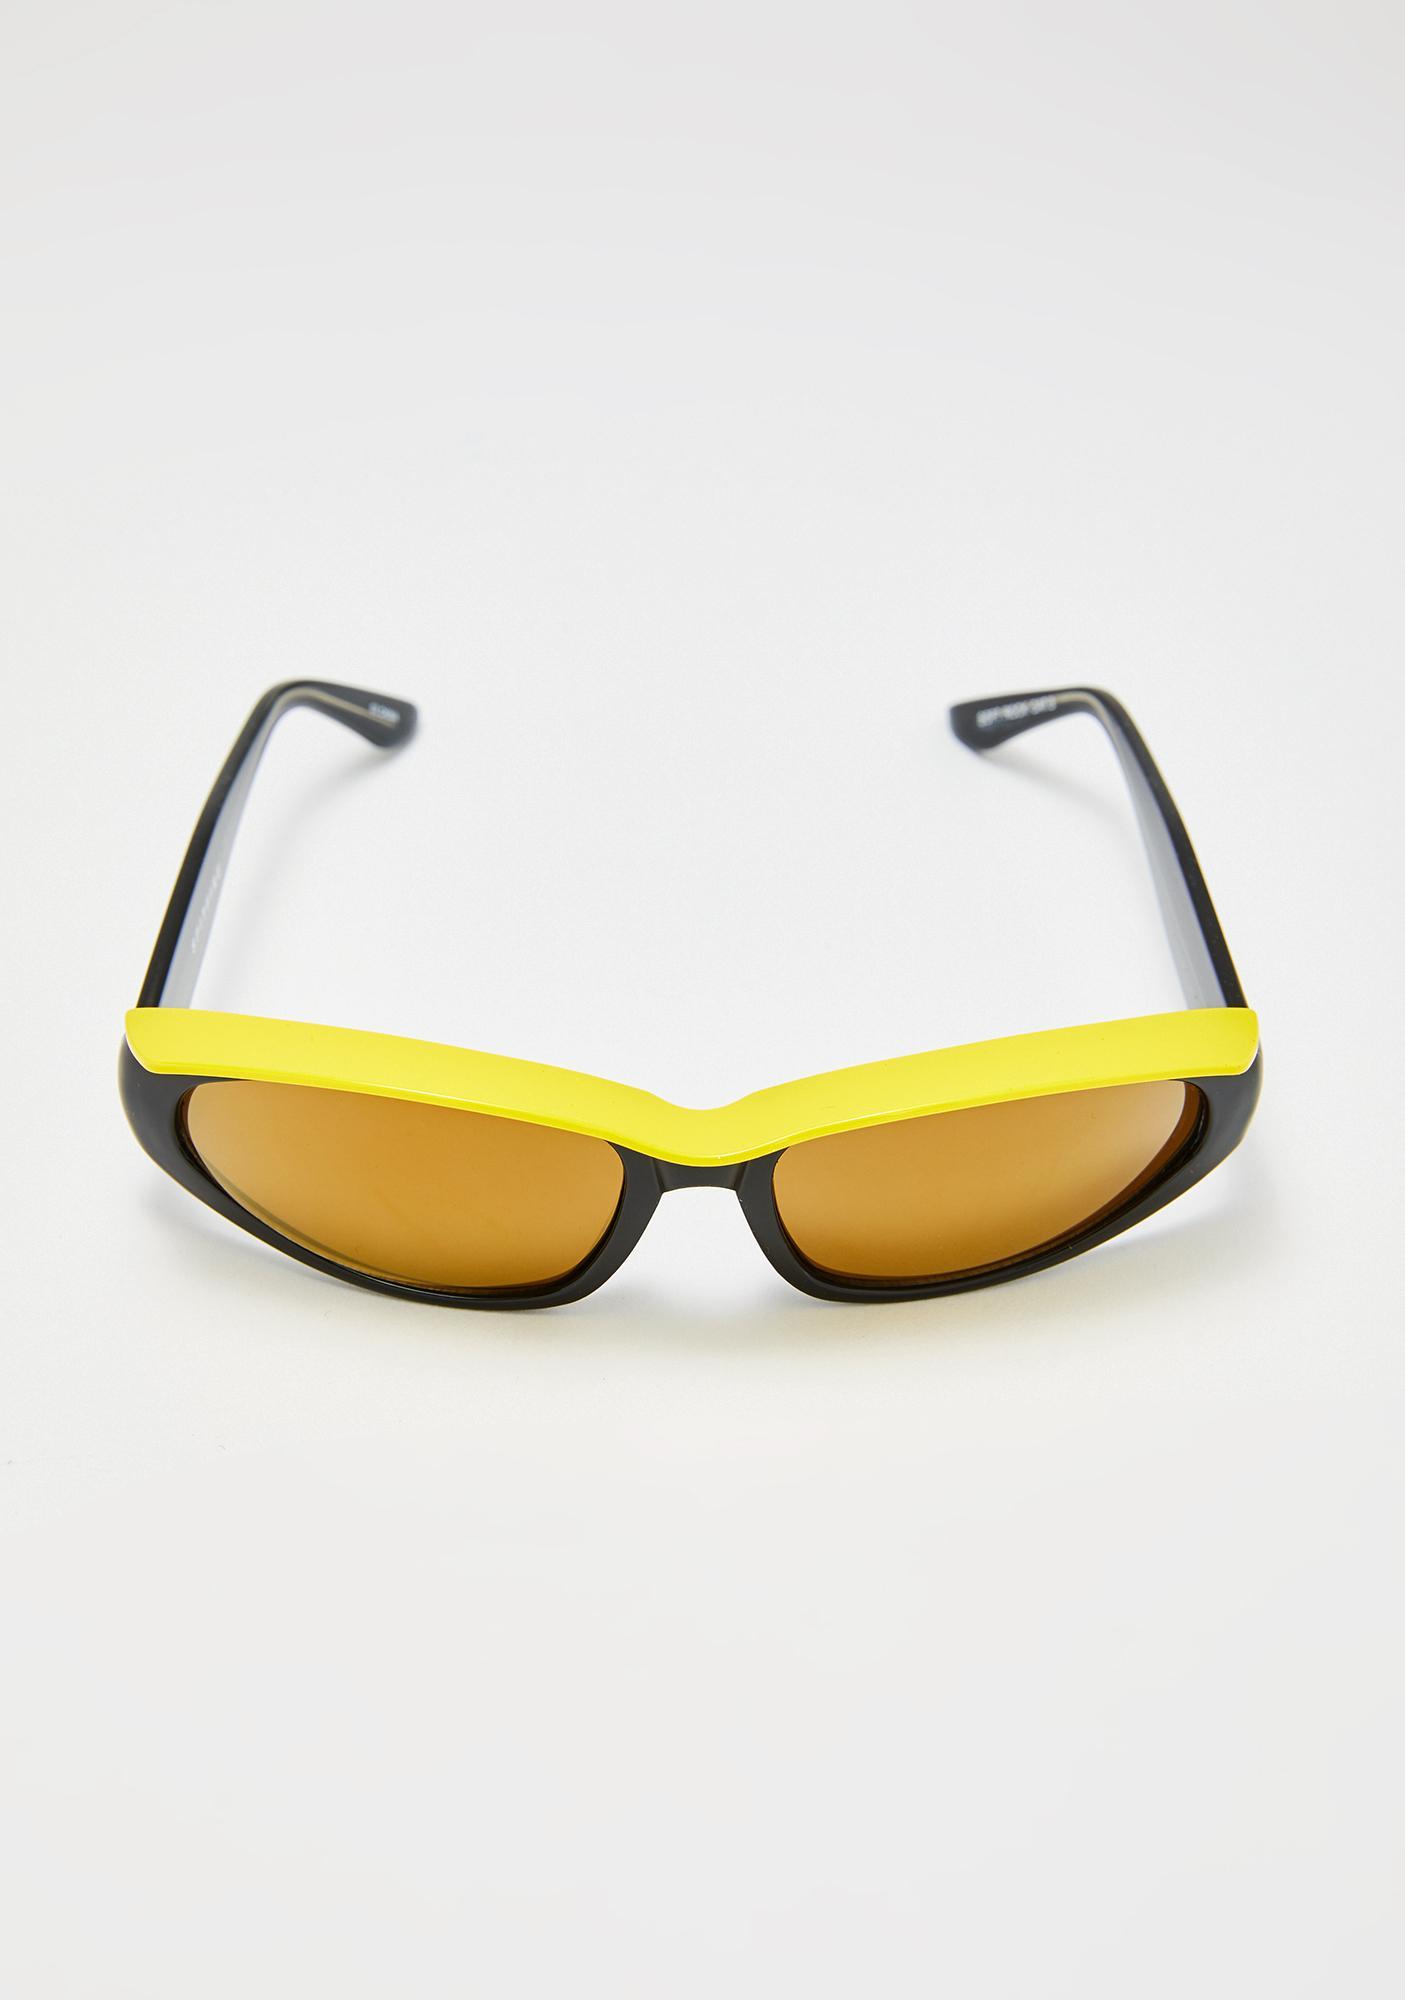 Spitfire Bodak Soft Rock Sunglasses